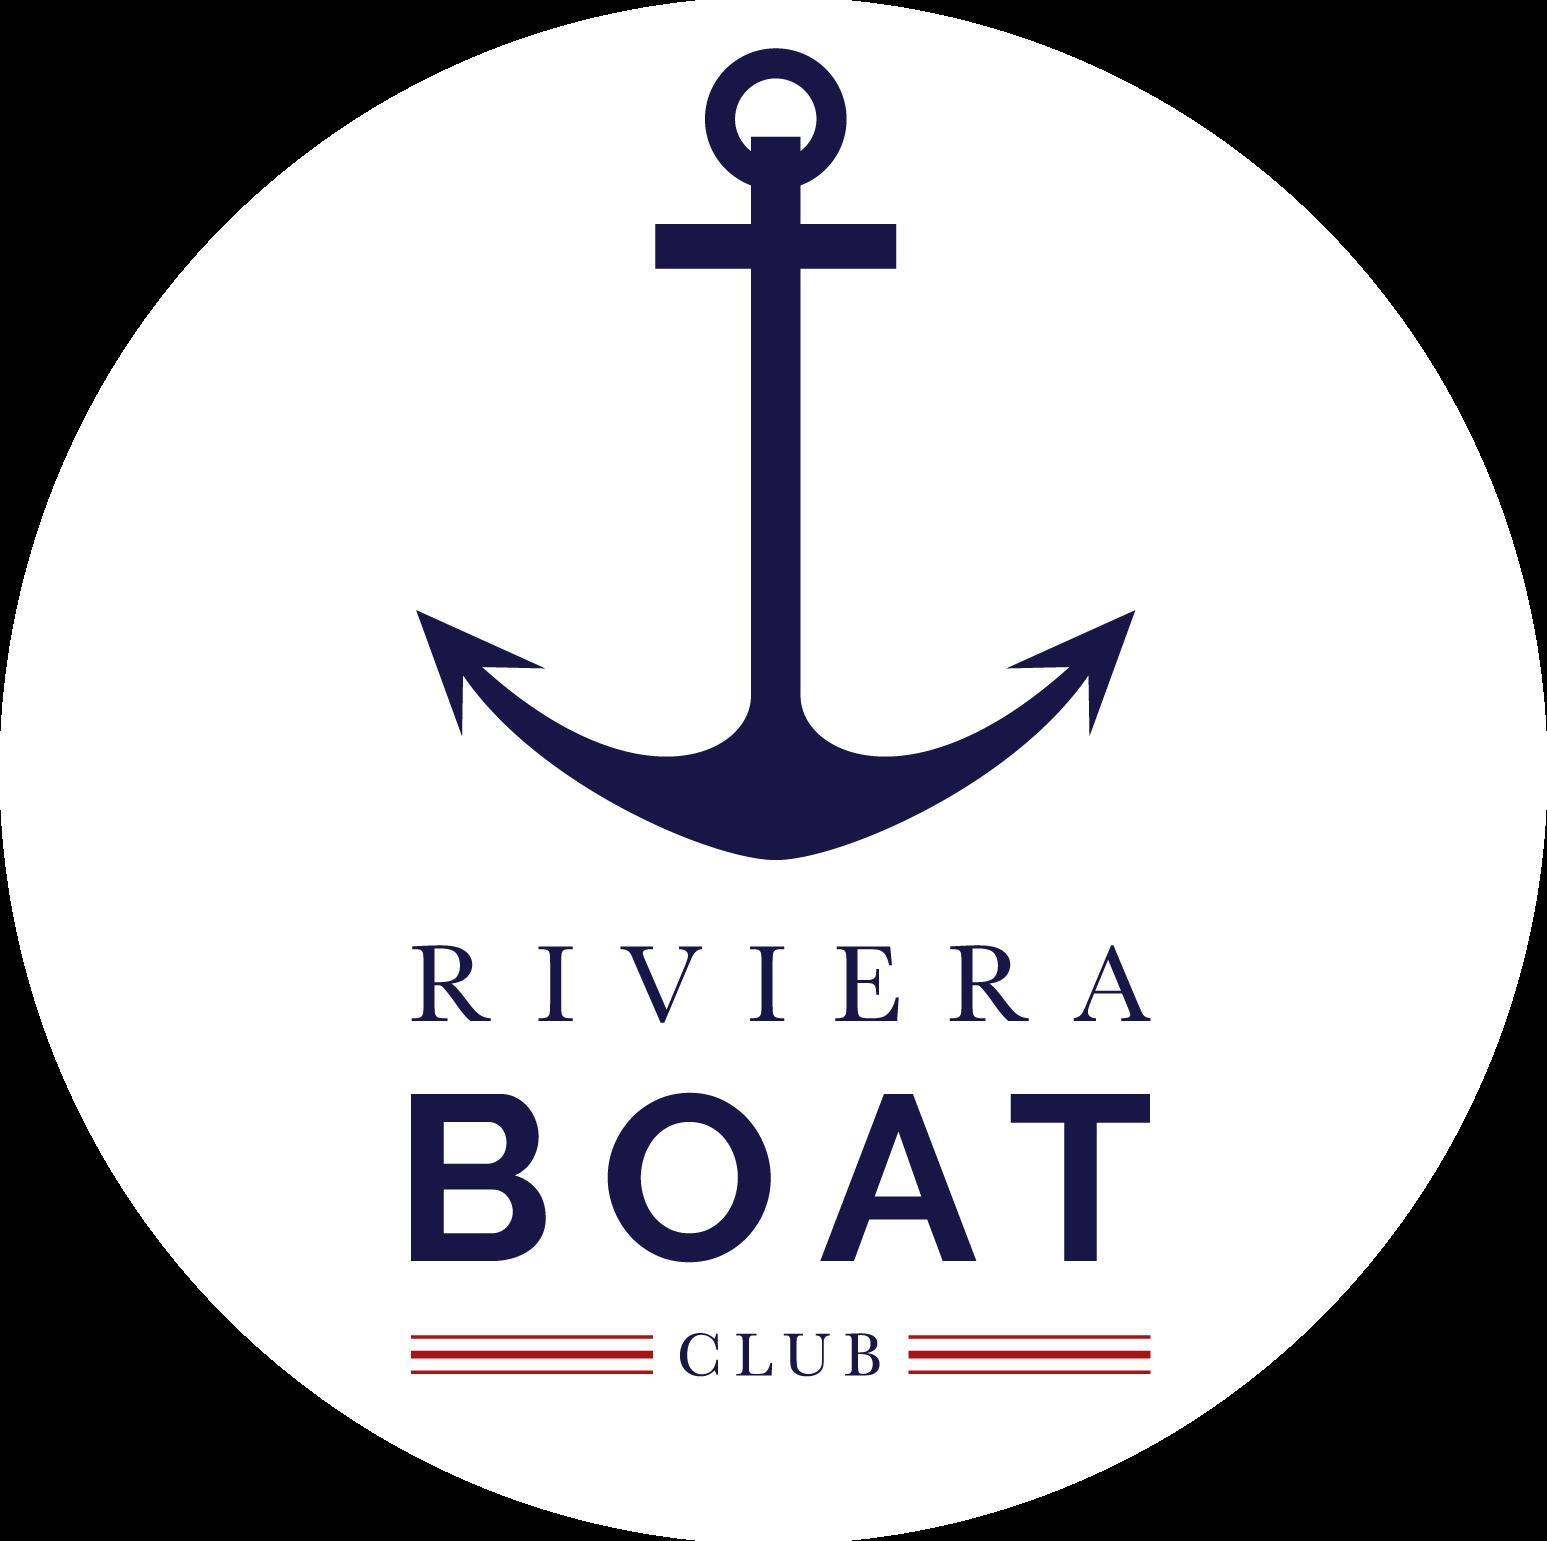 RIVIERA BOAT CLUB